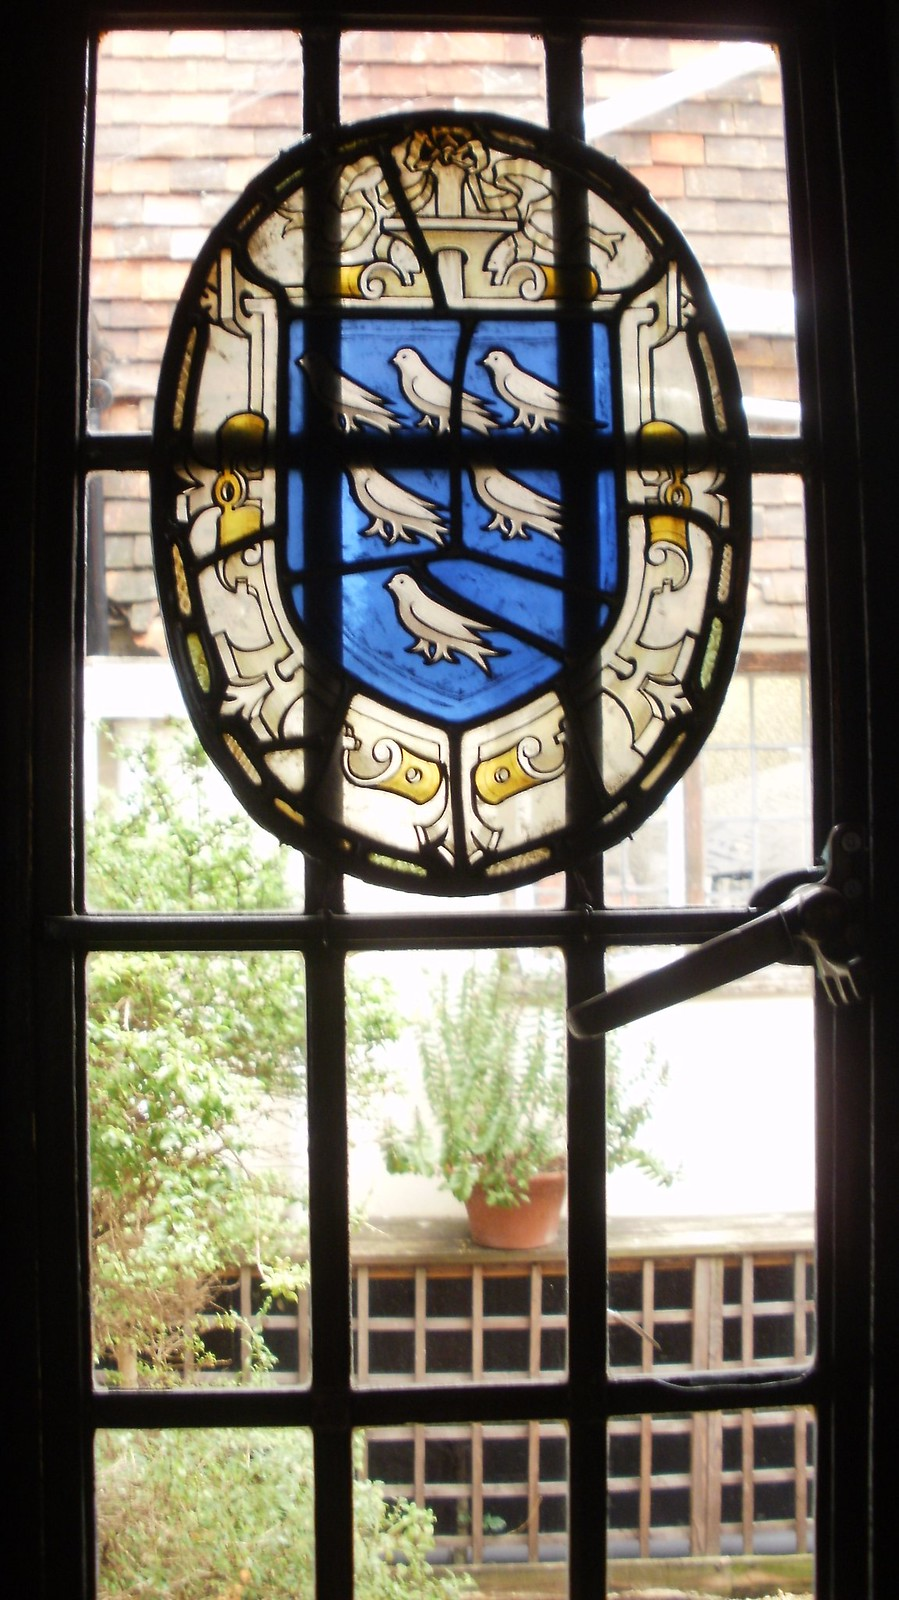 Chiddingfold window 3 OLYMPUS DIGITAL CAMERA